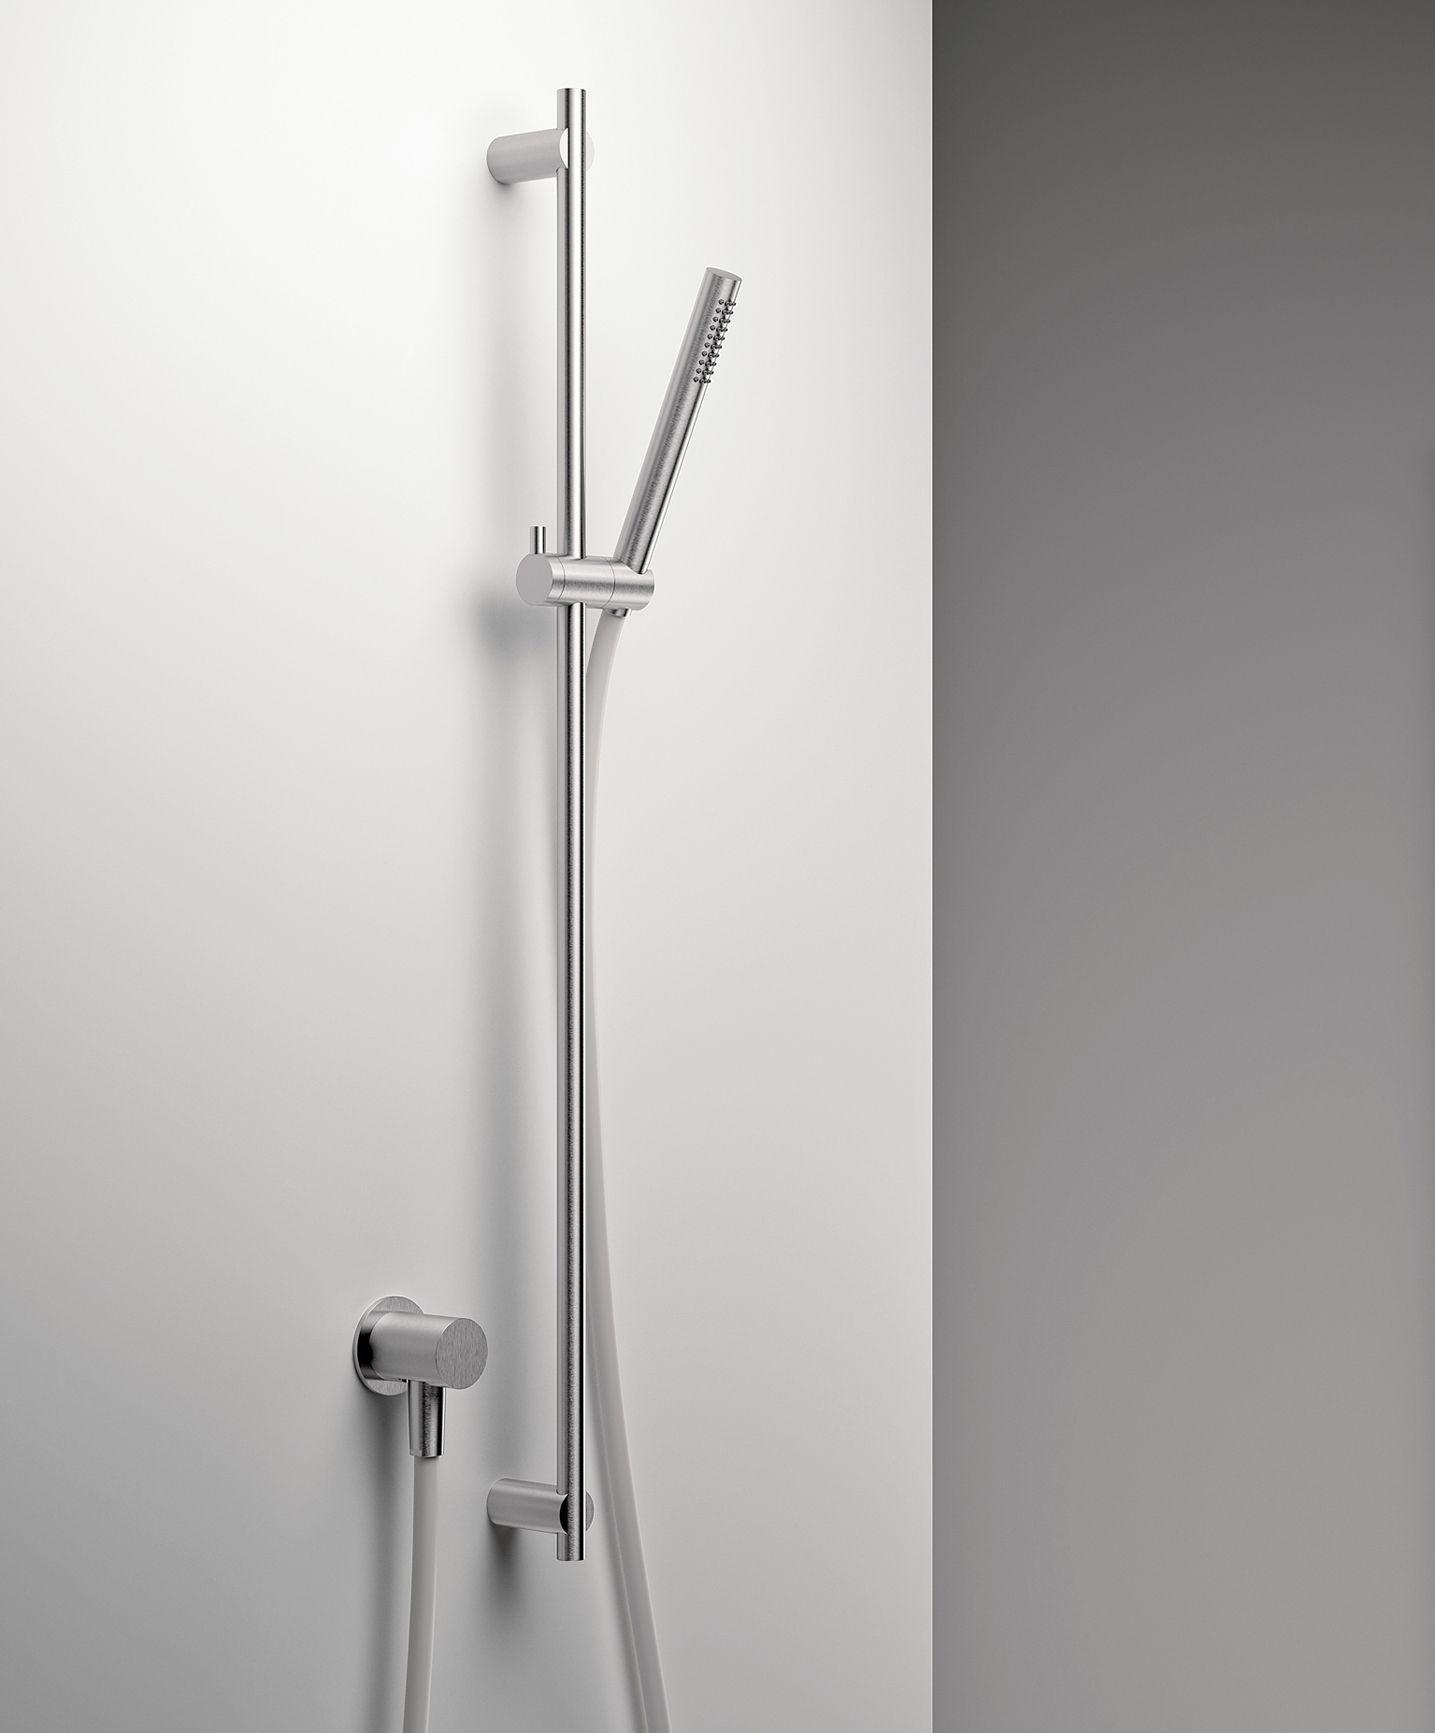 Zazzeri Z316 Shower Collection_Asta saliscendi design